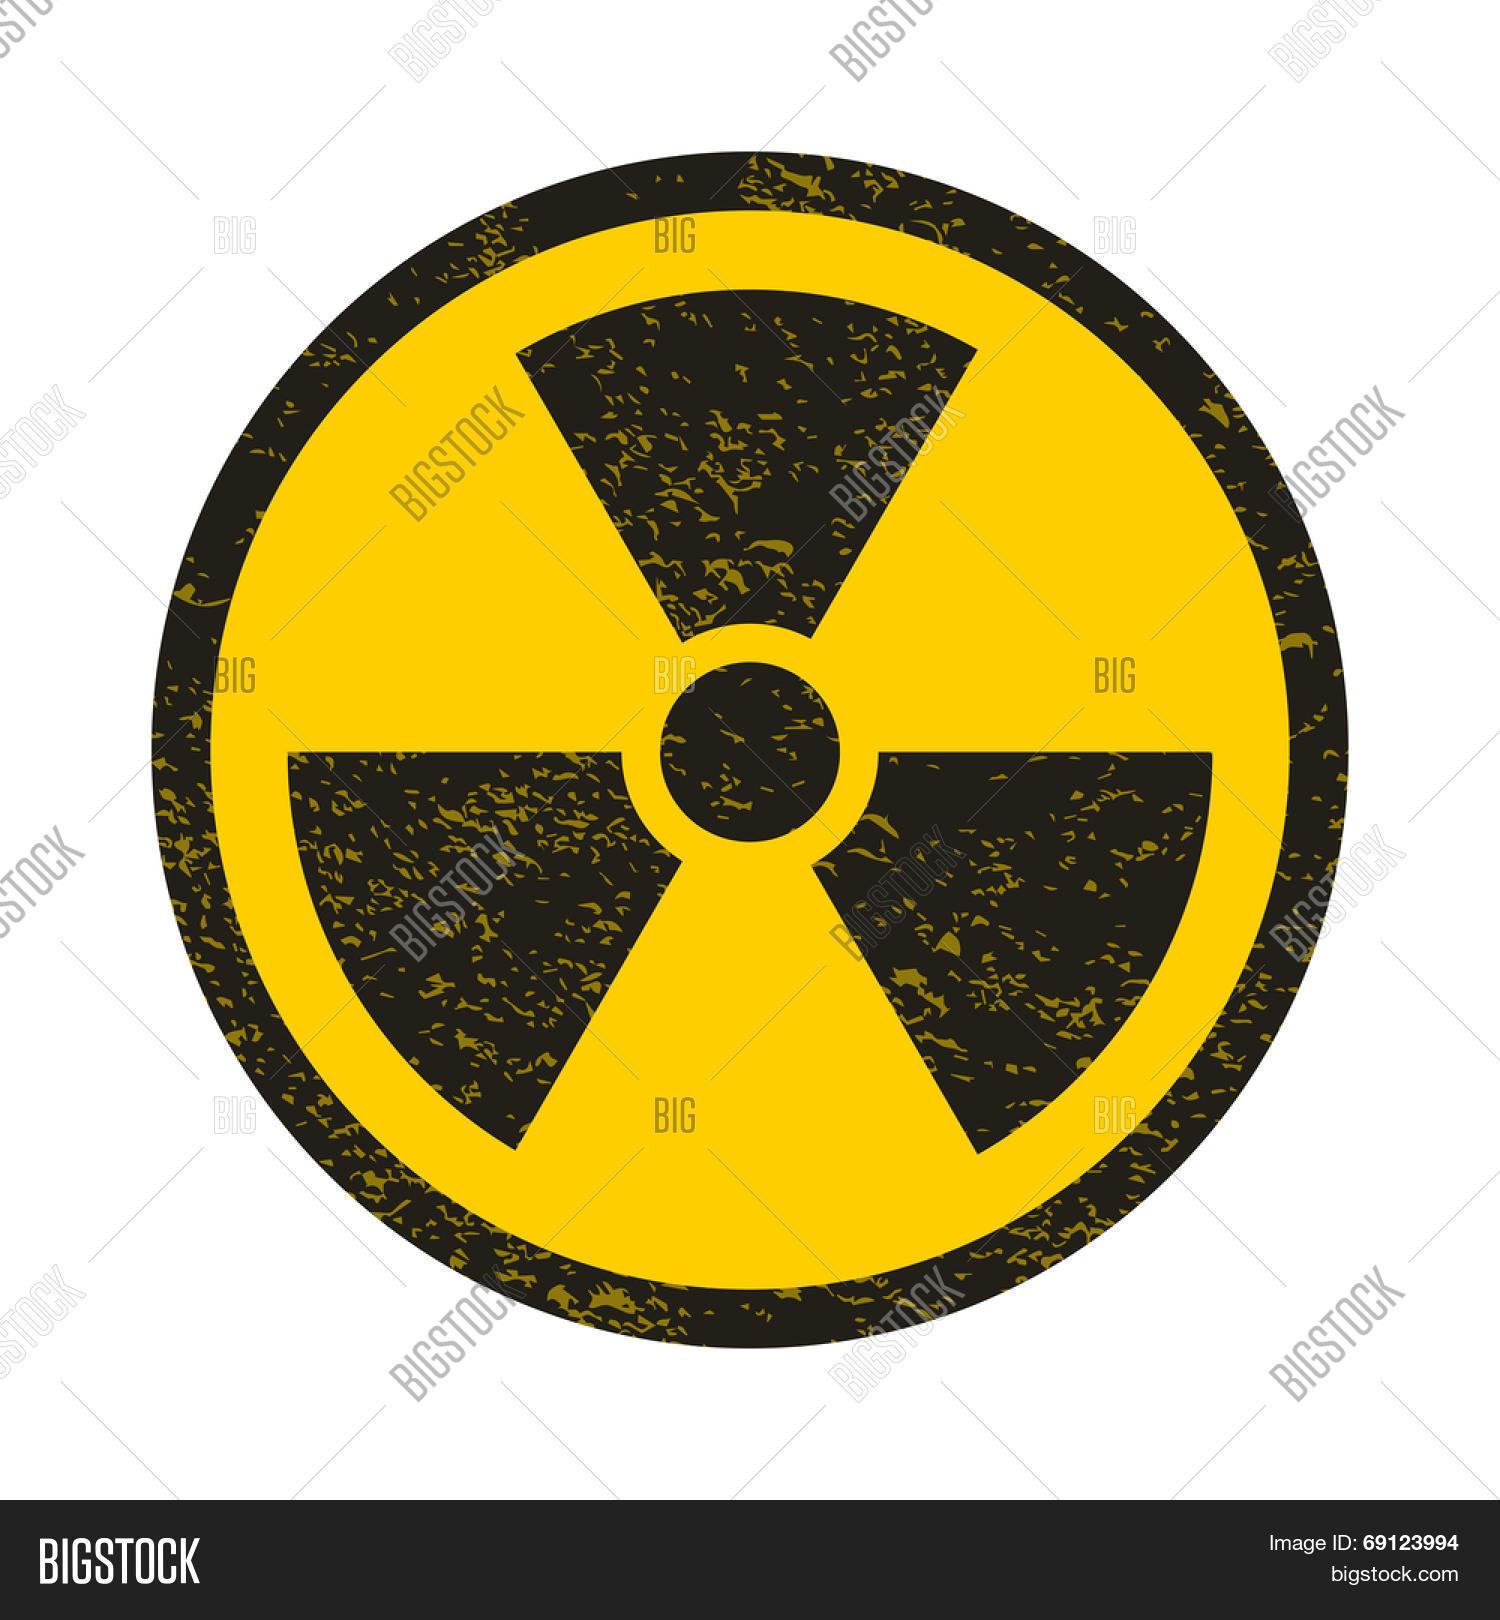 Grunge Nuclear Symbol Vector Vector & Photo | Bigstock